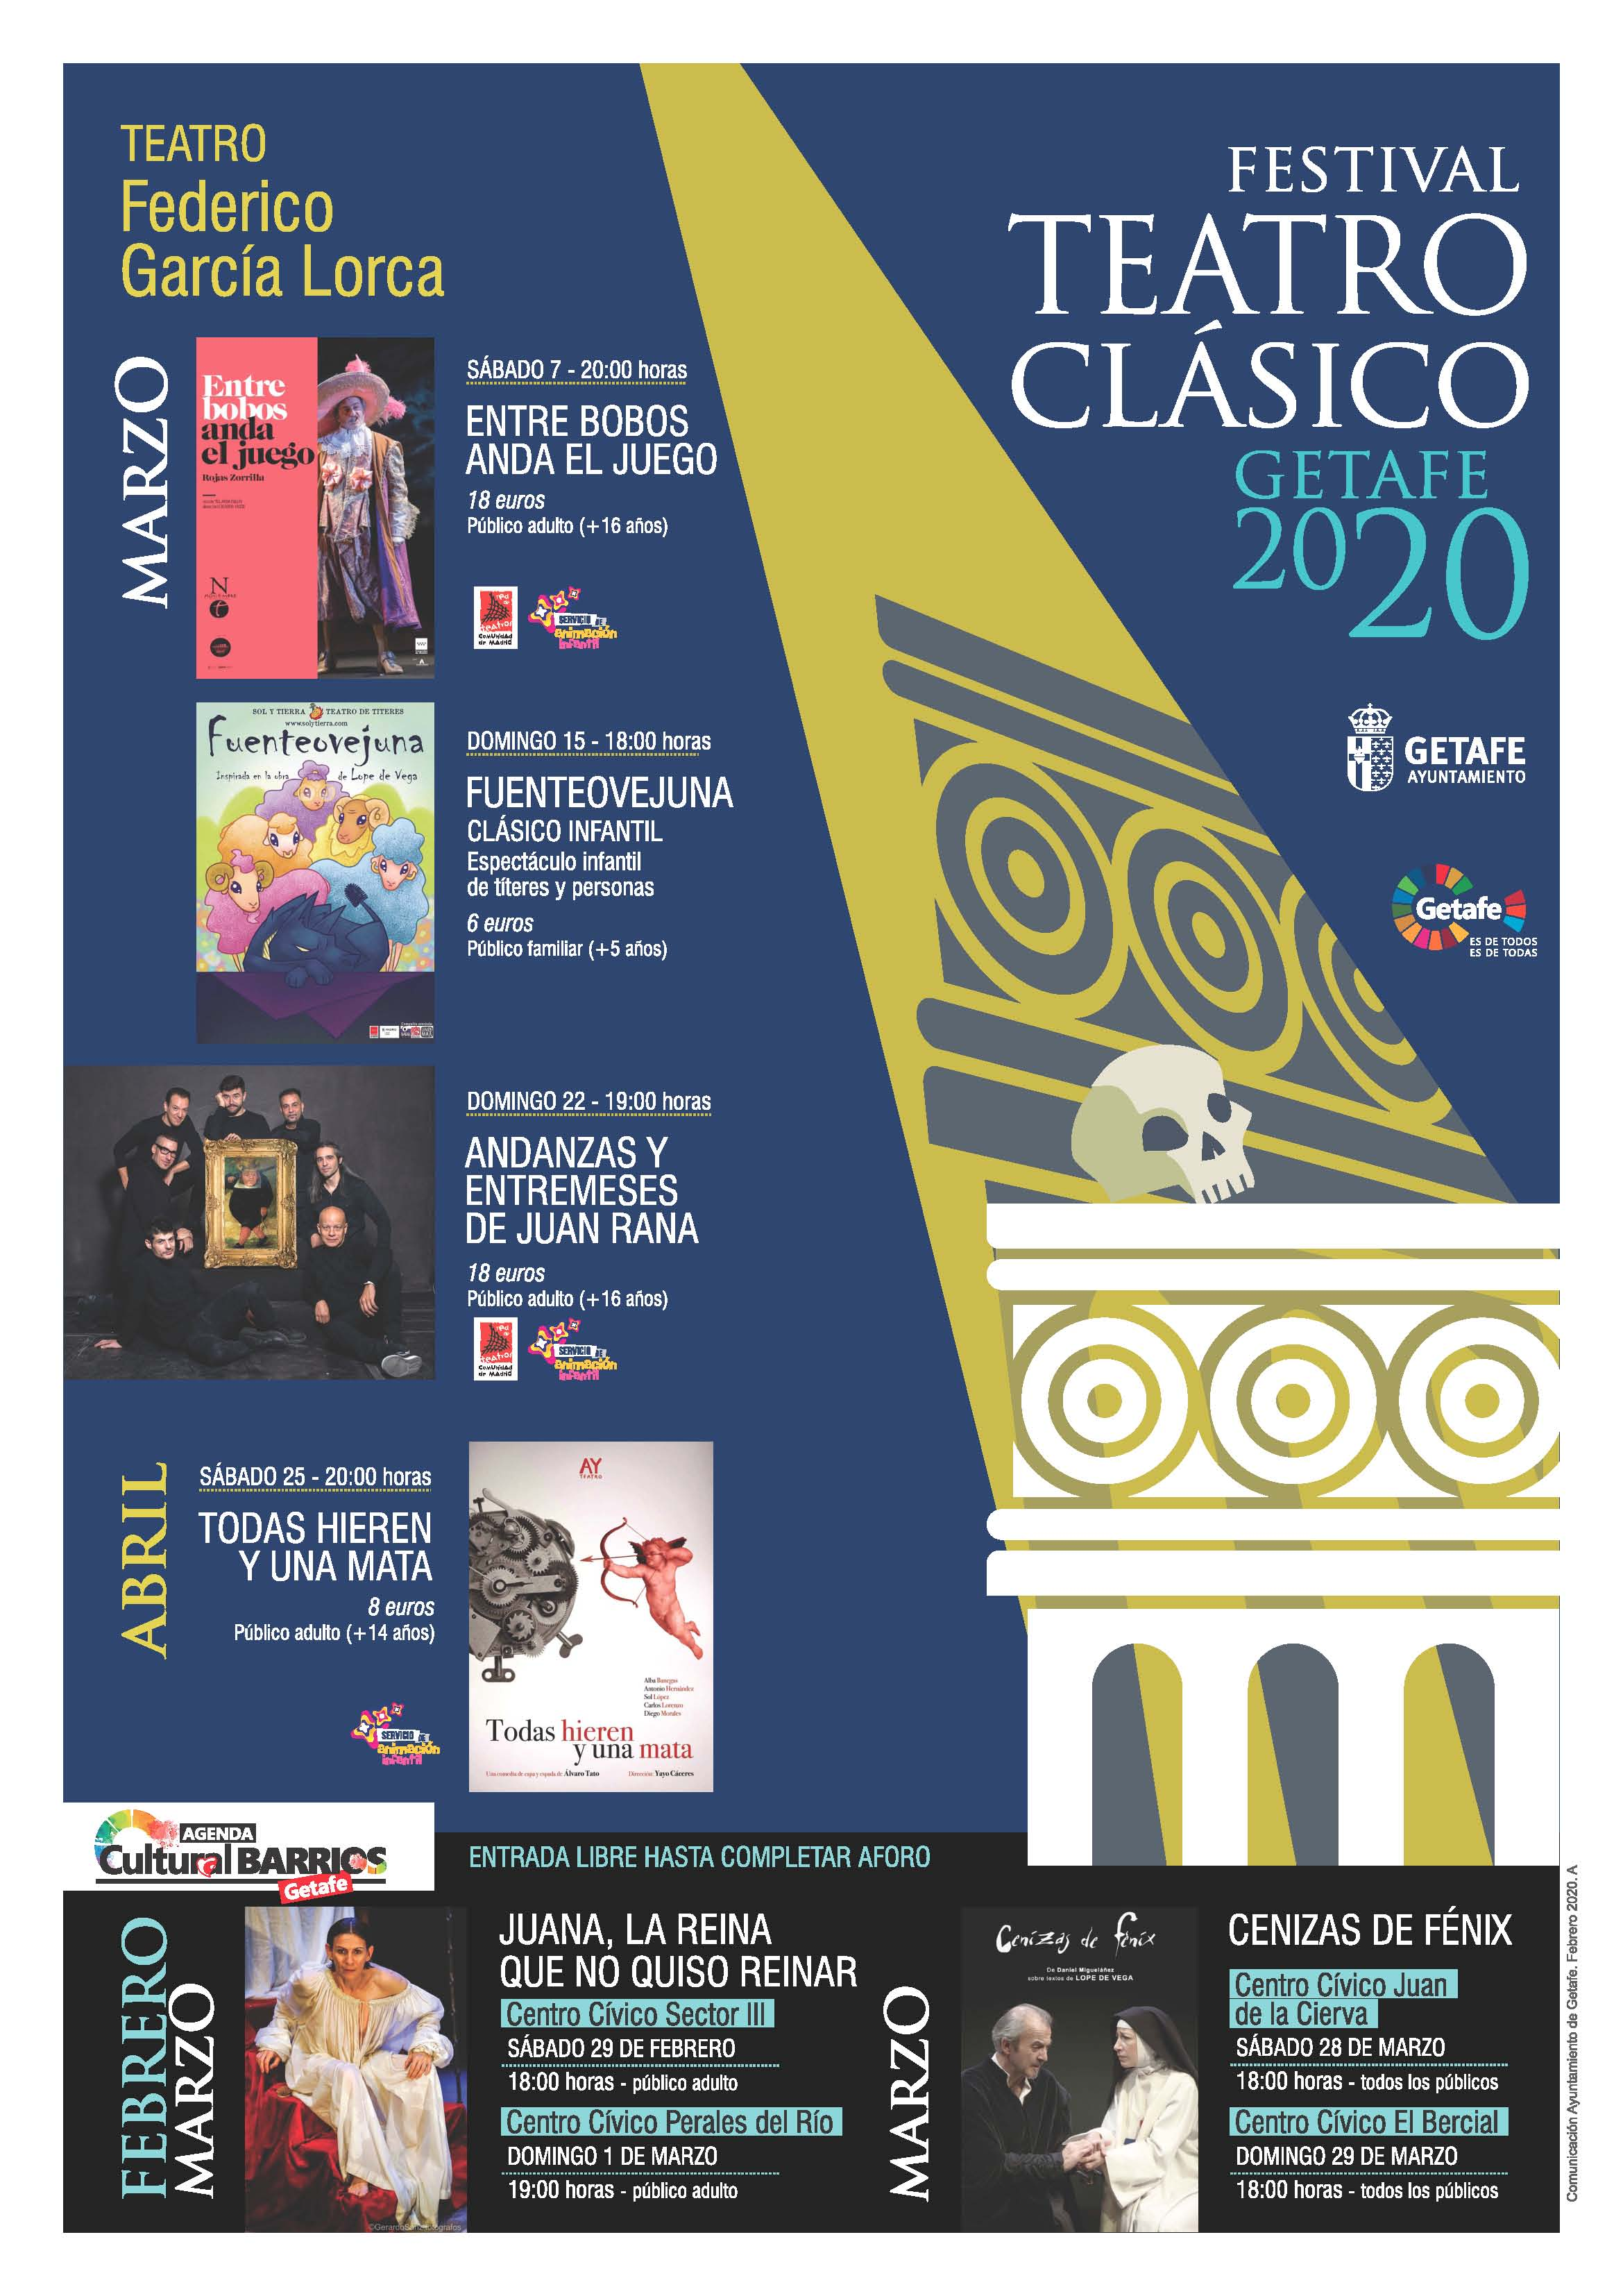 Festival Teatro Clásico